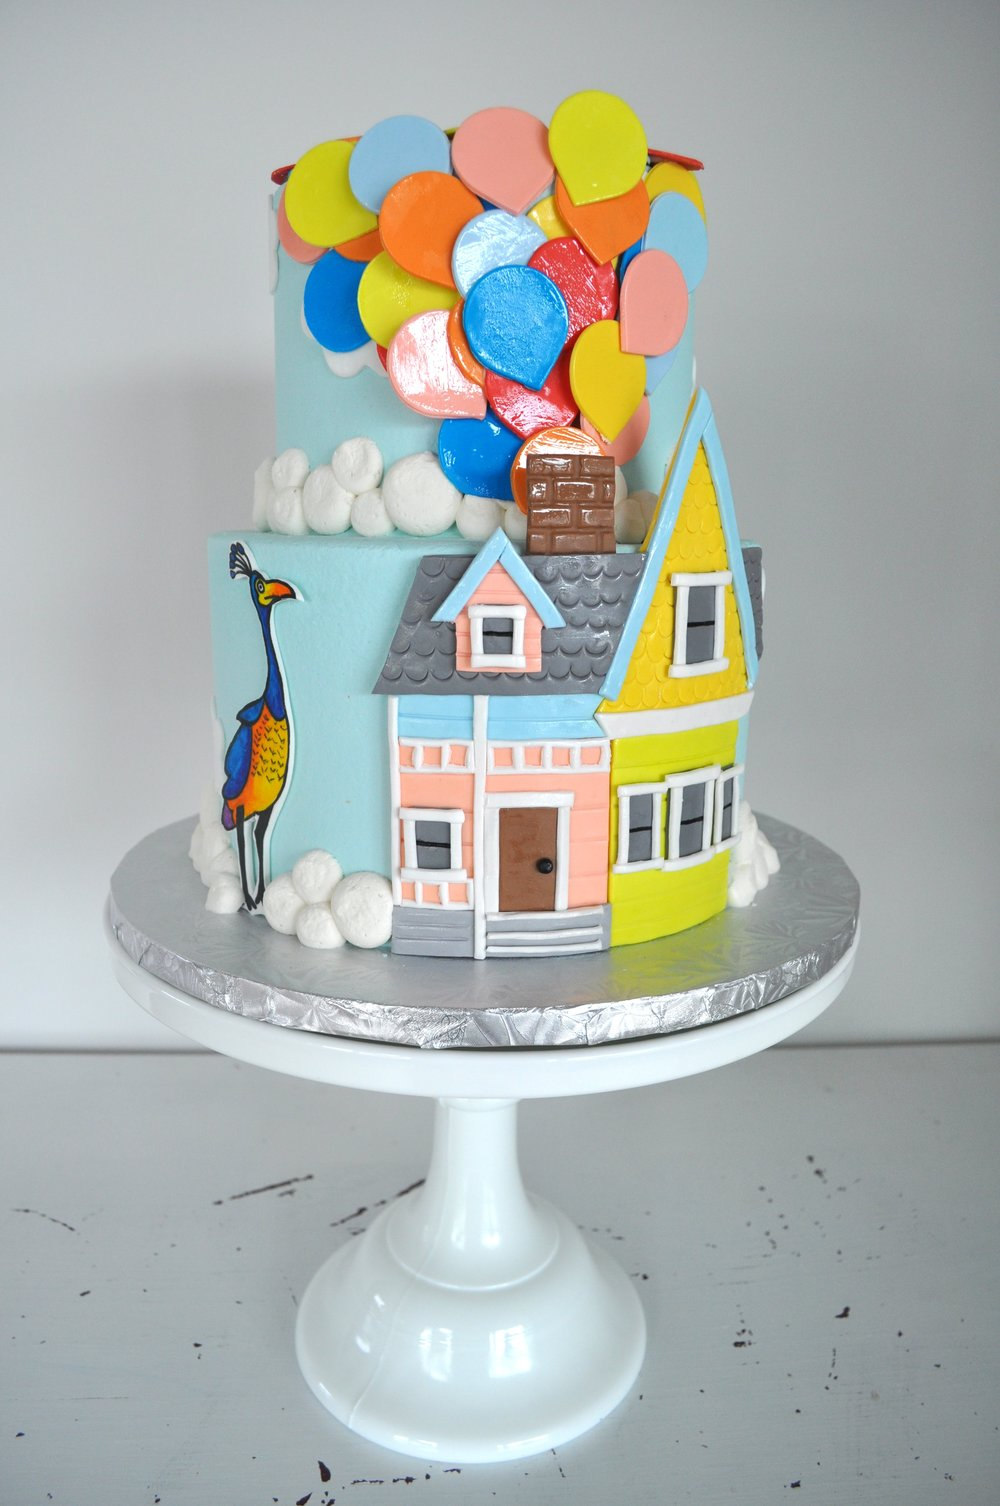 Up Cake With Bird.jpg